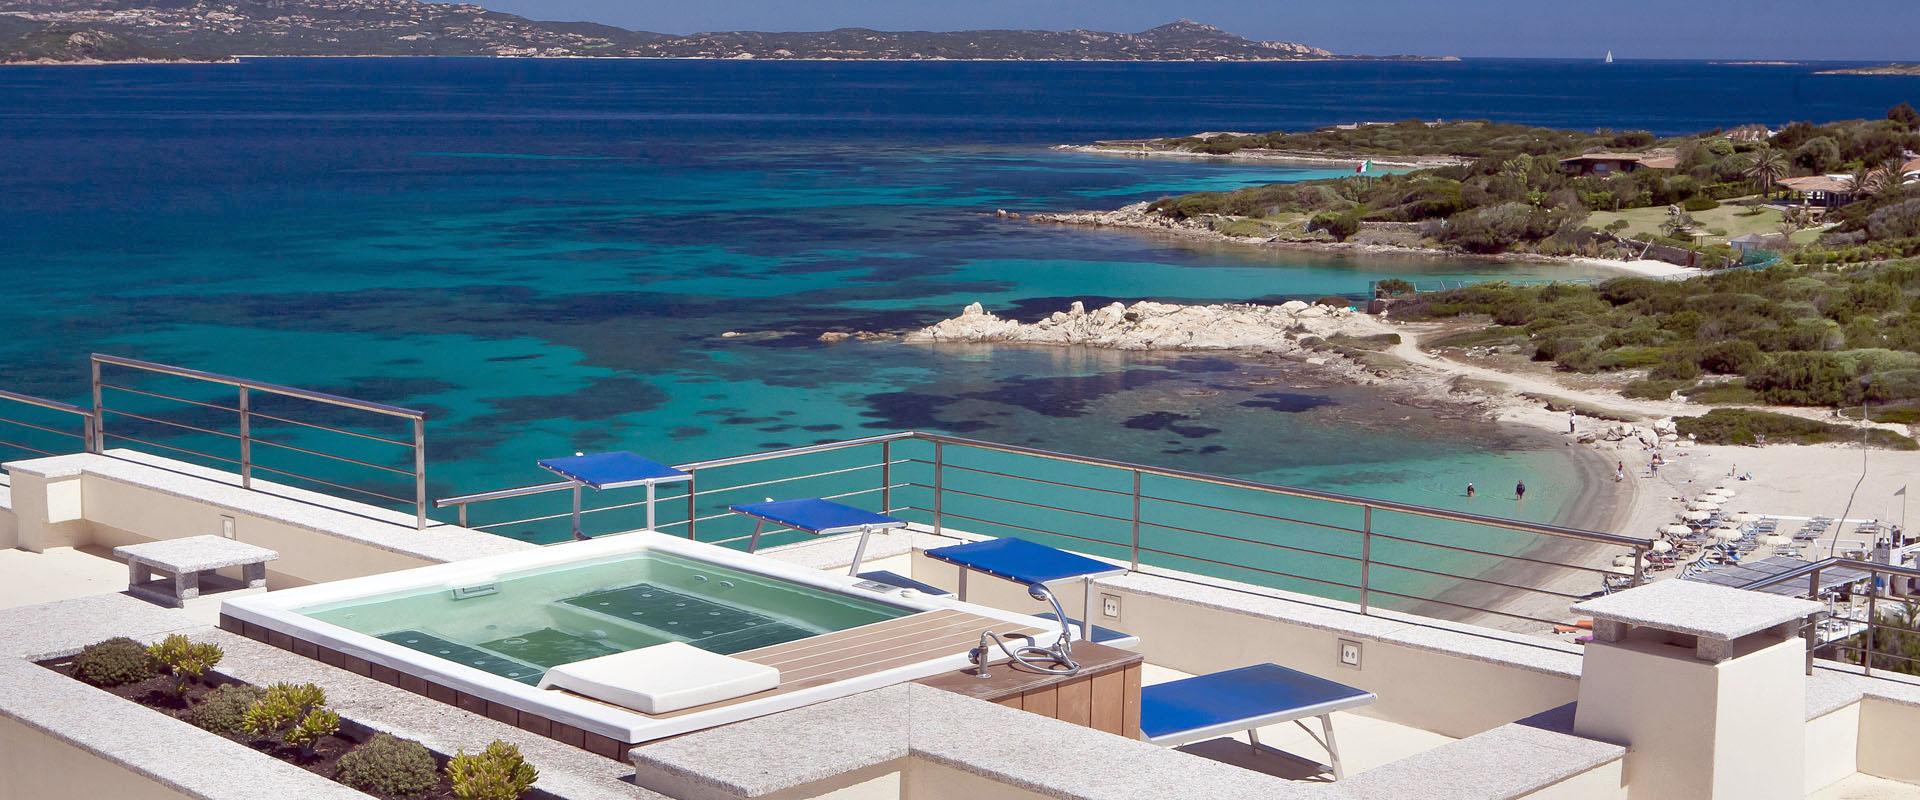 Luxury-Villa-WhiteBEach-Portorotondo-Sardinia-Rent14